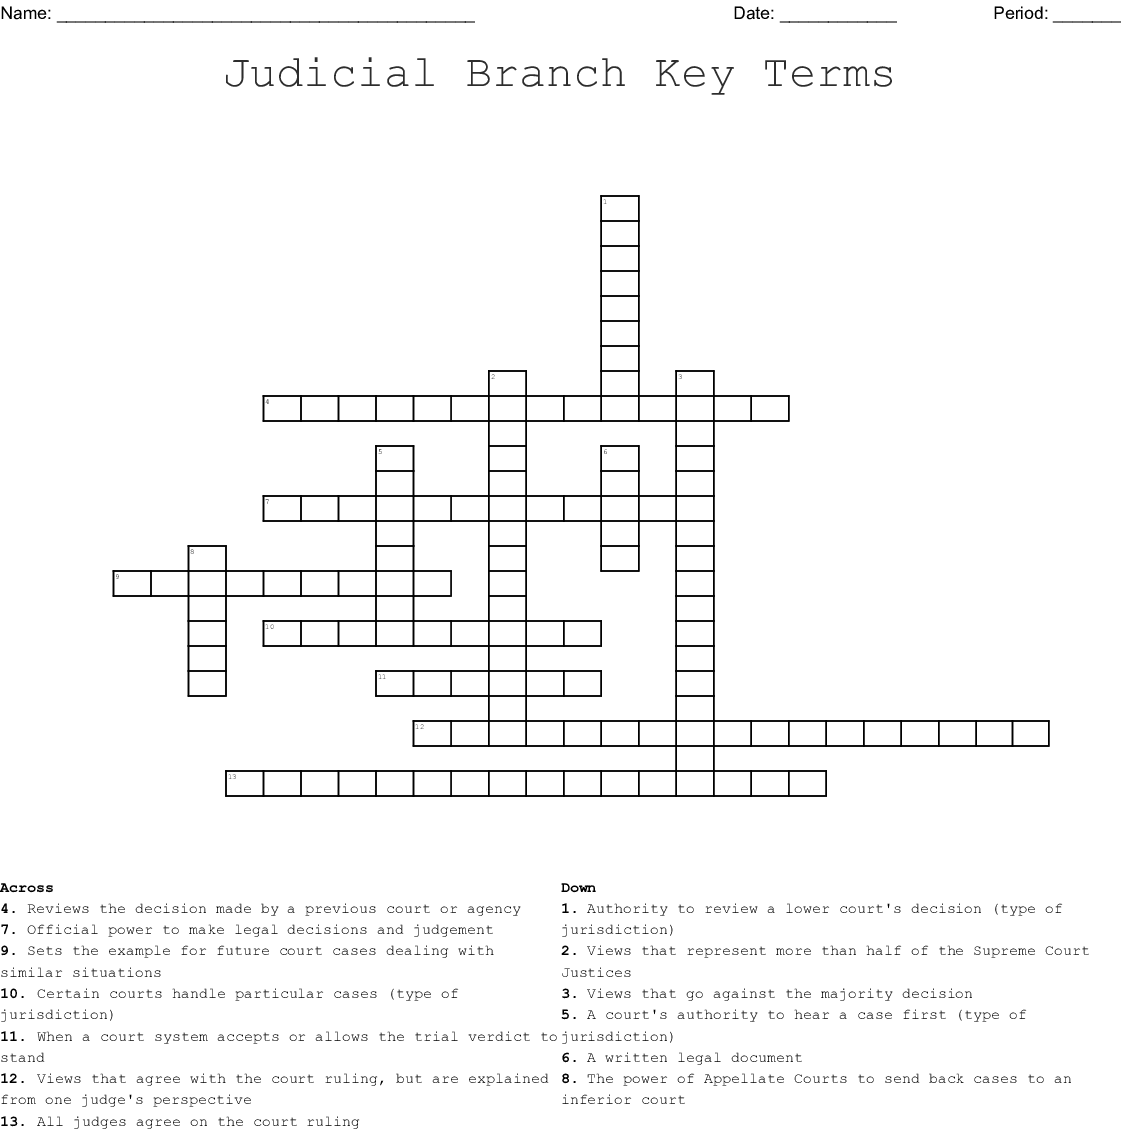 Judicial Branch Key Terms Crossword - WordMint